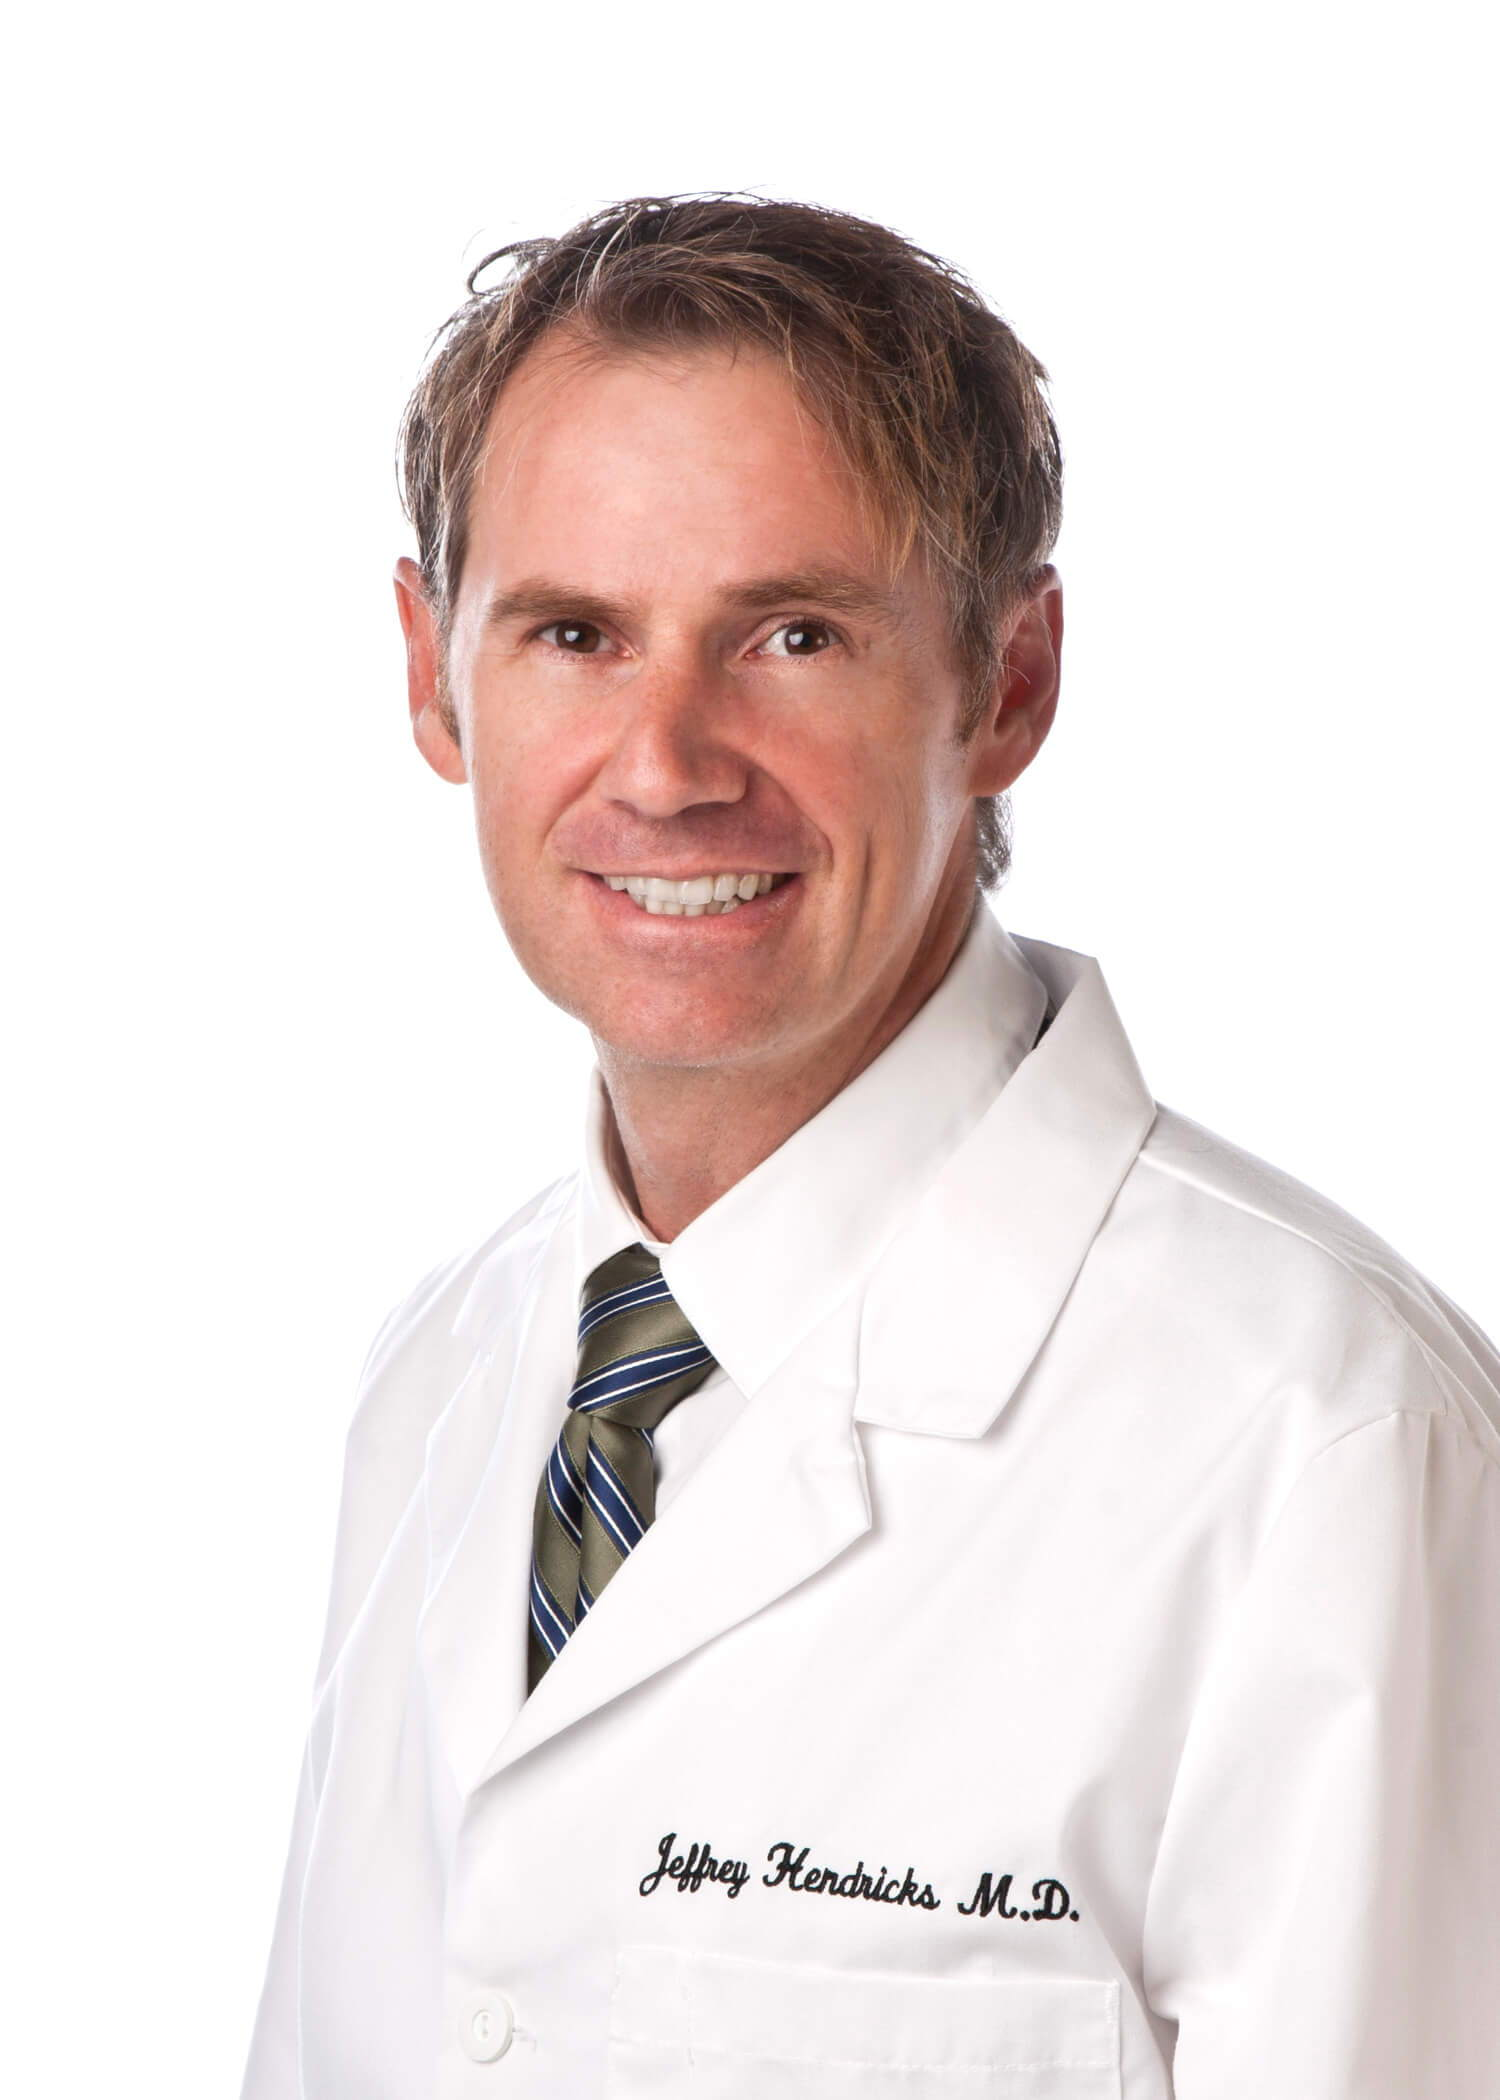 dr-hendricks-md-certified-supplements-omnibiotics-tnypng